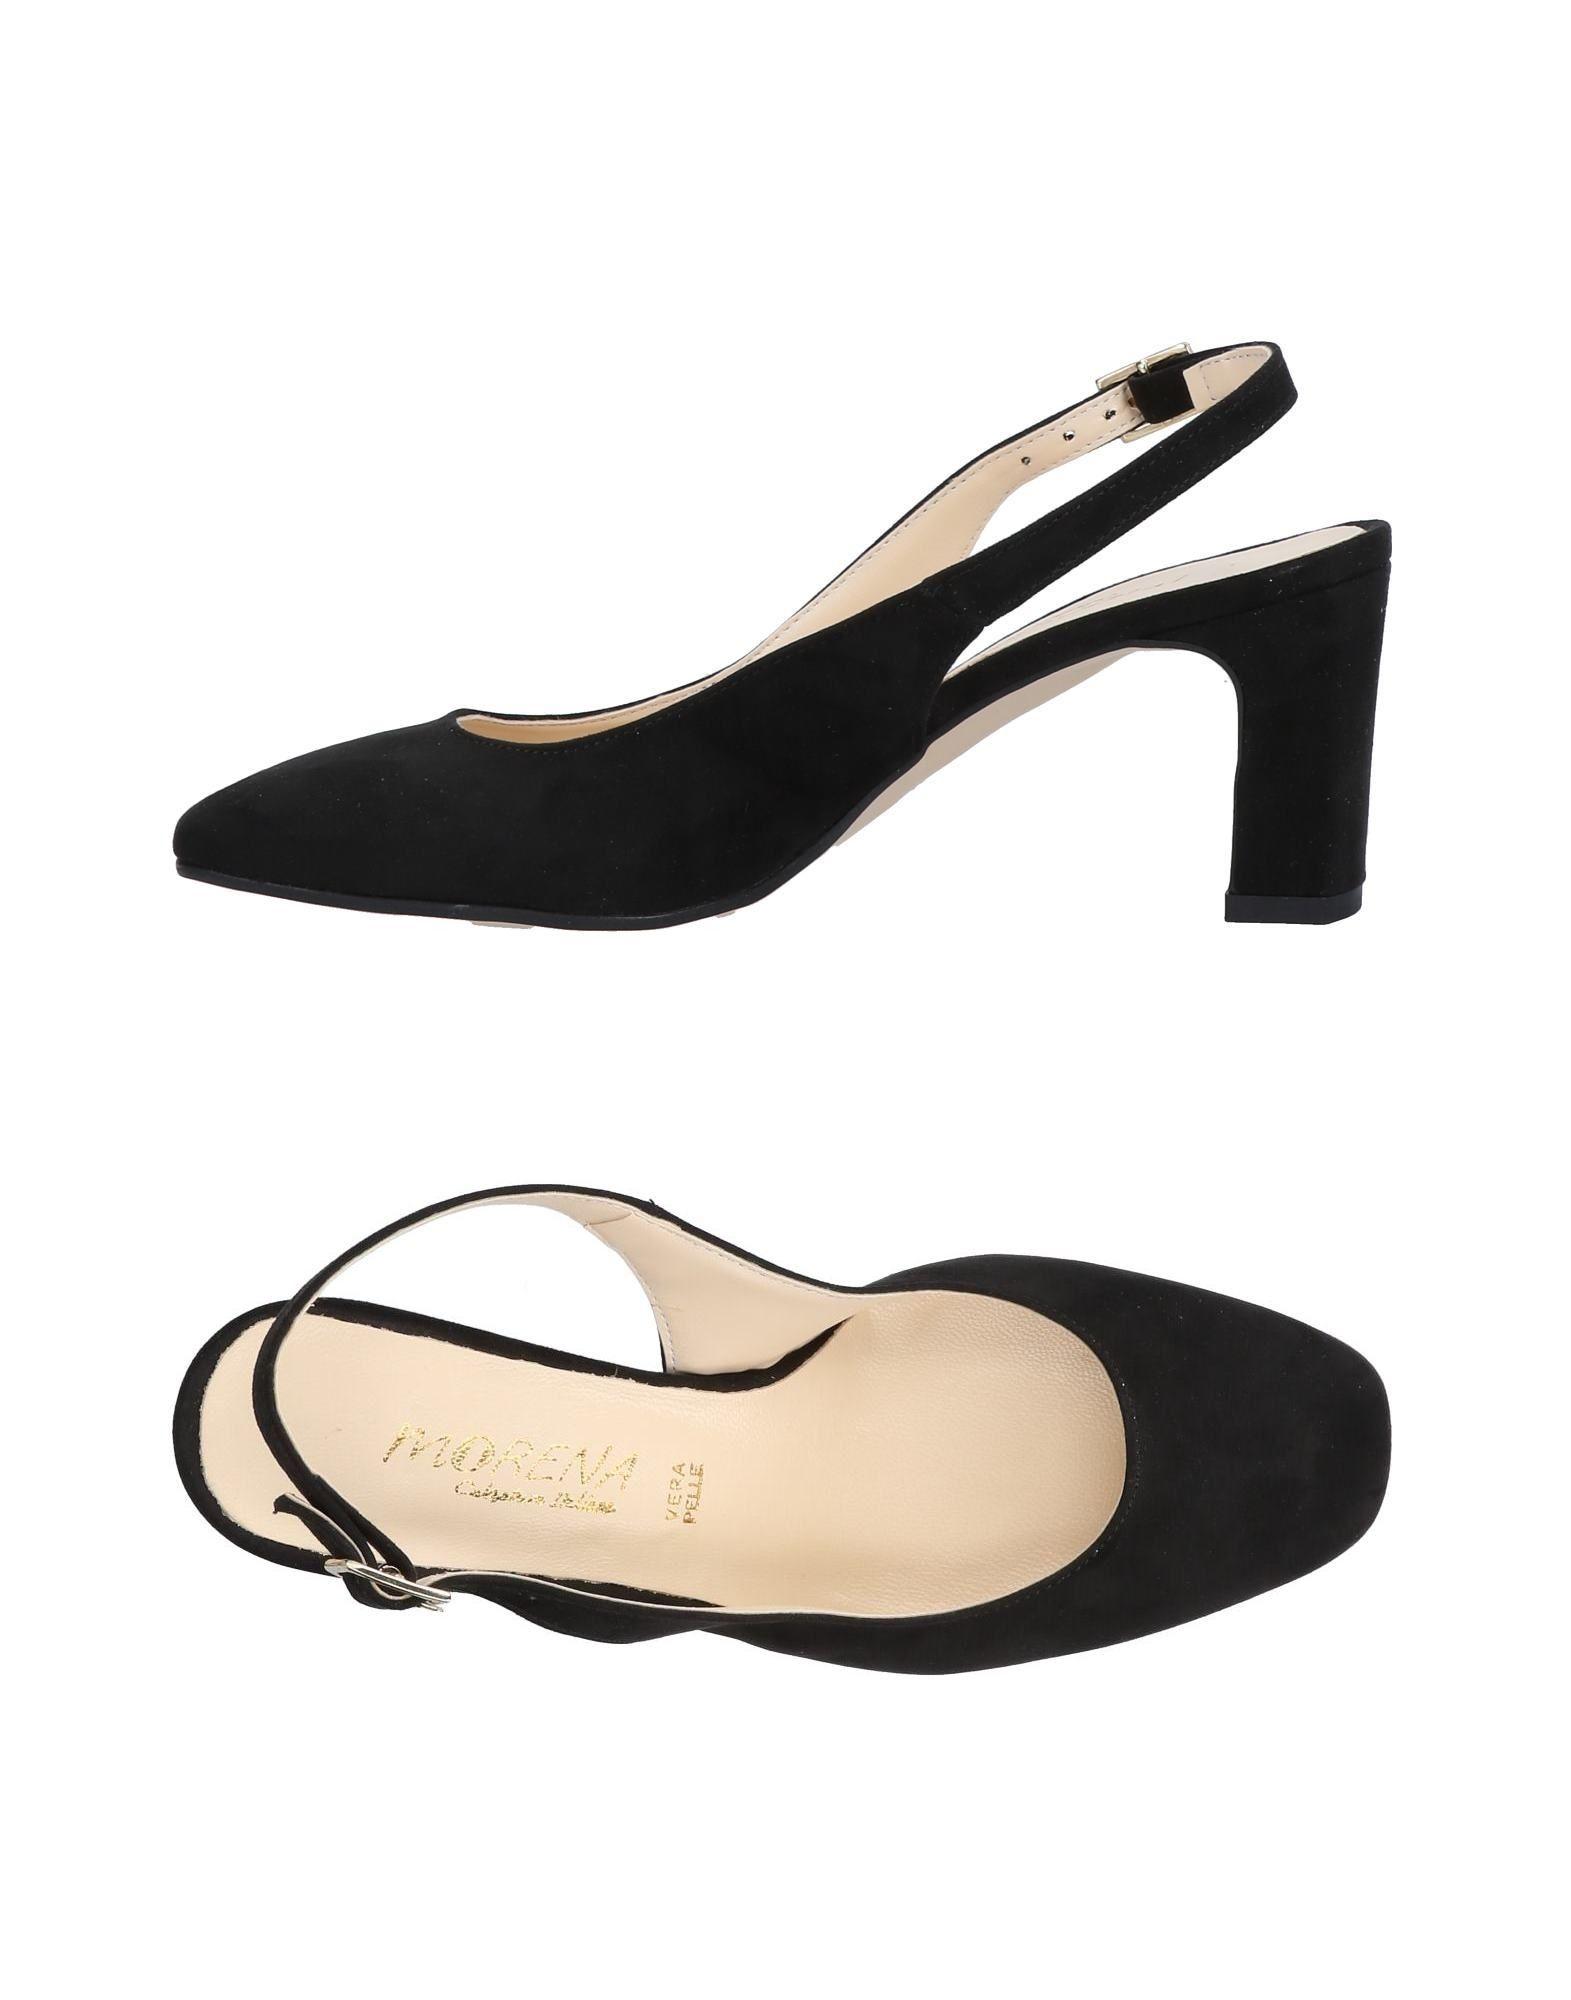 MORENA CALZATURE ITALIANE Туфли цены онлайн